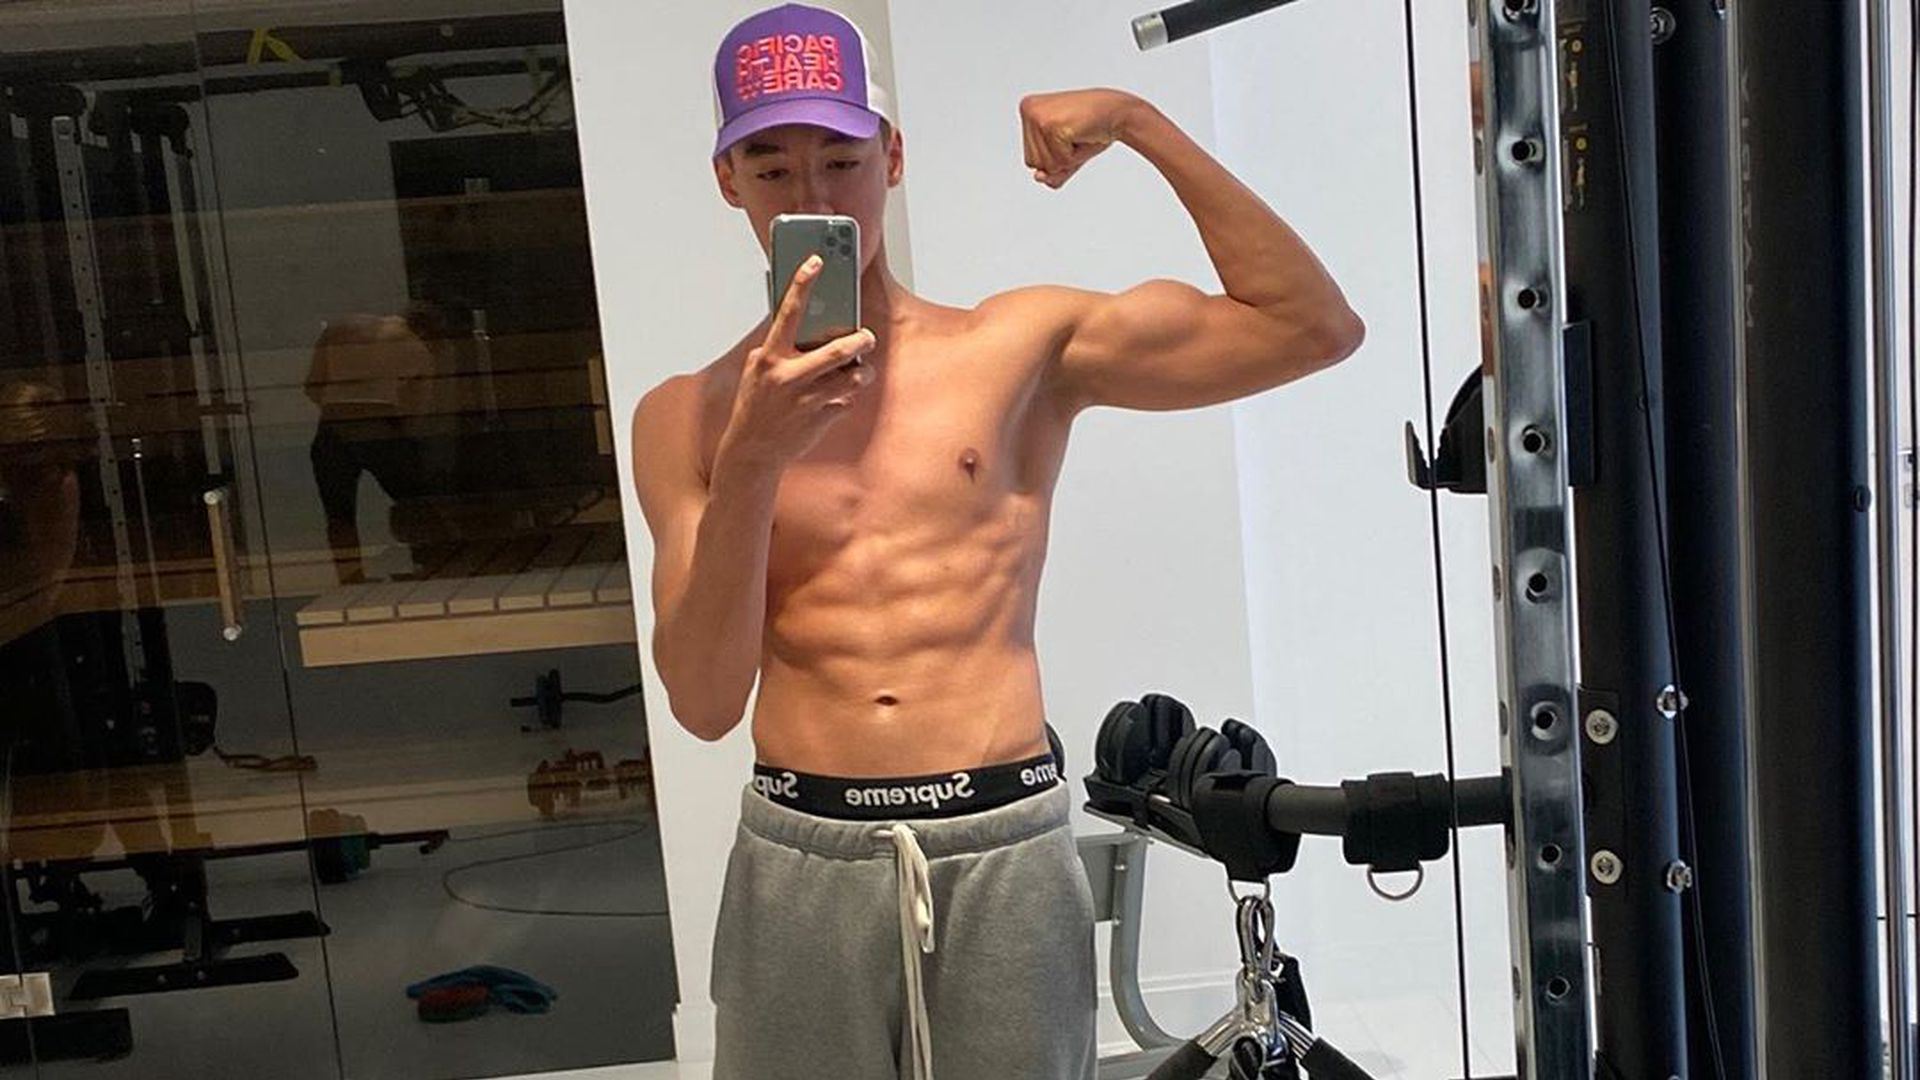 Hingucker: Verona Pooths Sohn San Diego (16) zeigt Sixpack